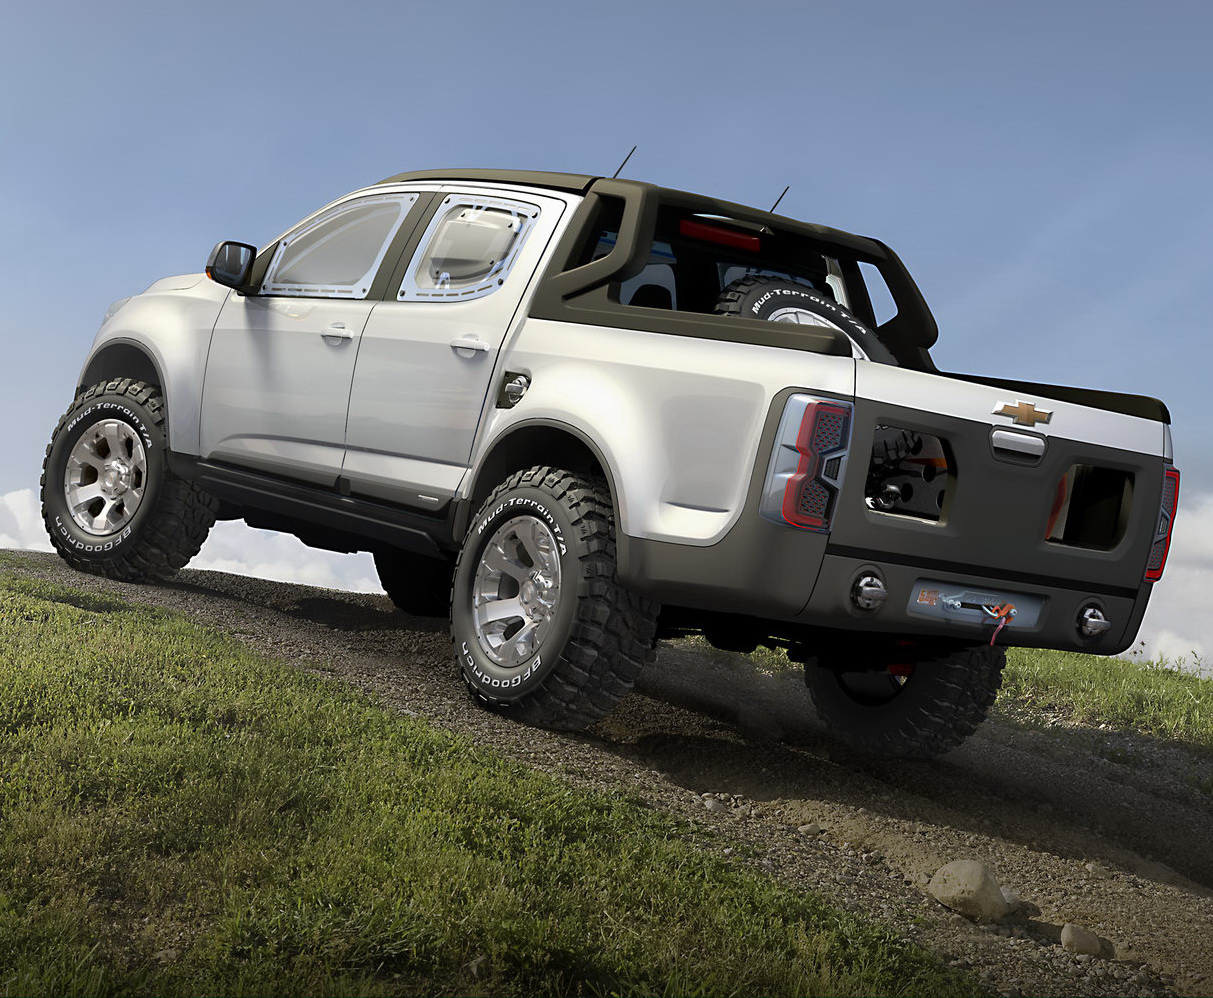 Chevy Truck Rally Wheels